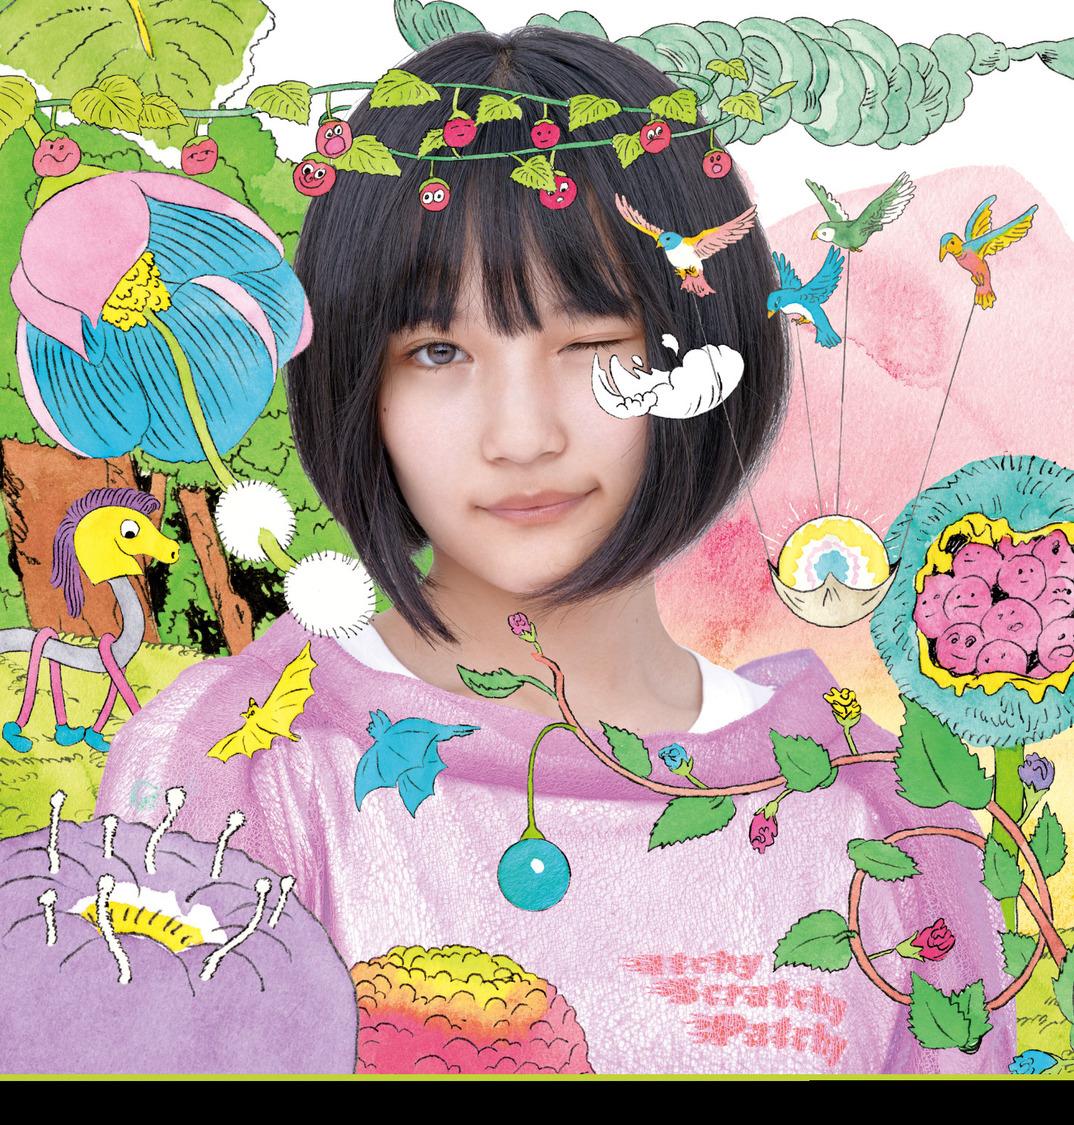 AKB48、「サステナブル」がレコ協2ミリオン認定に